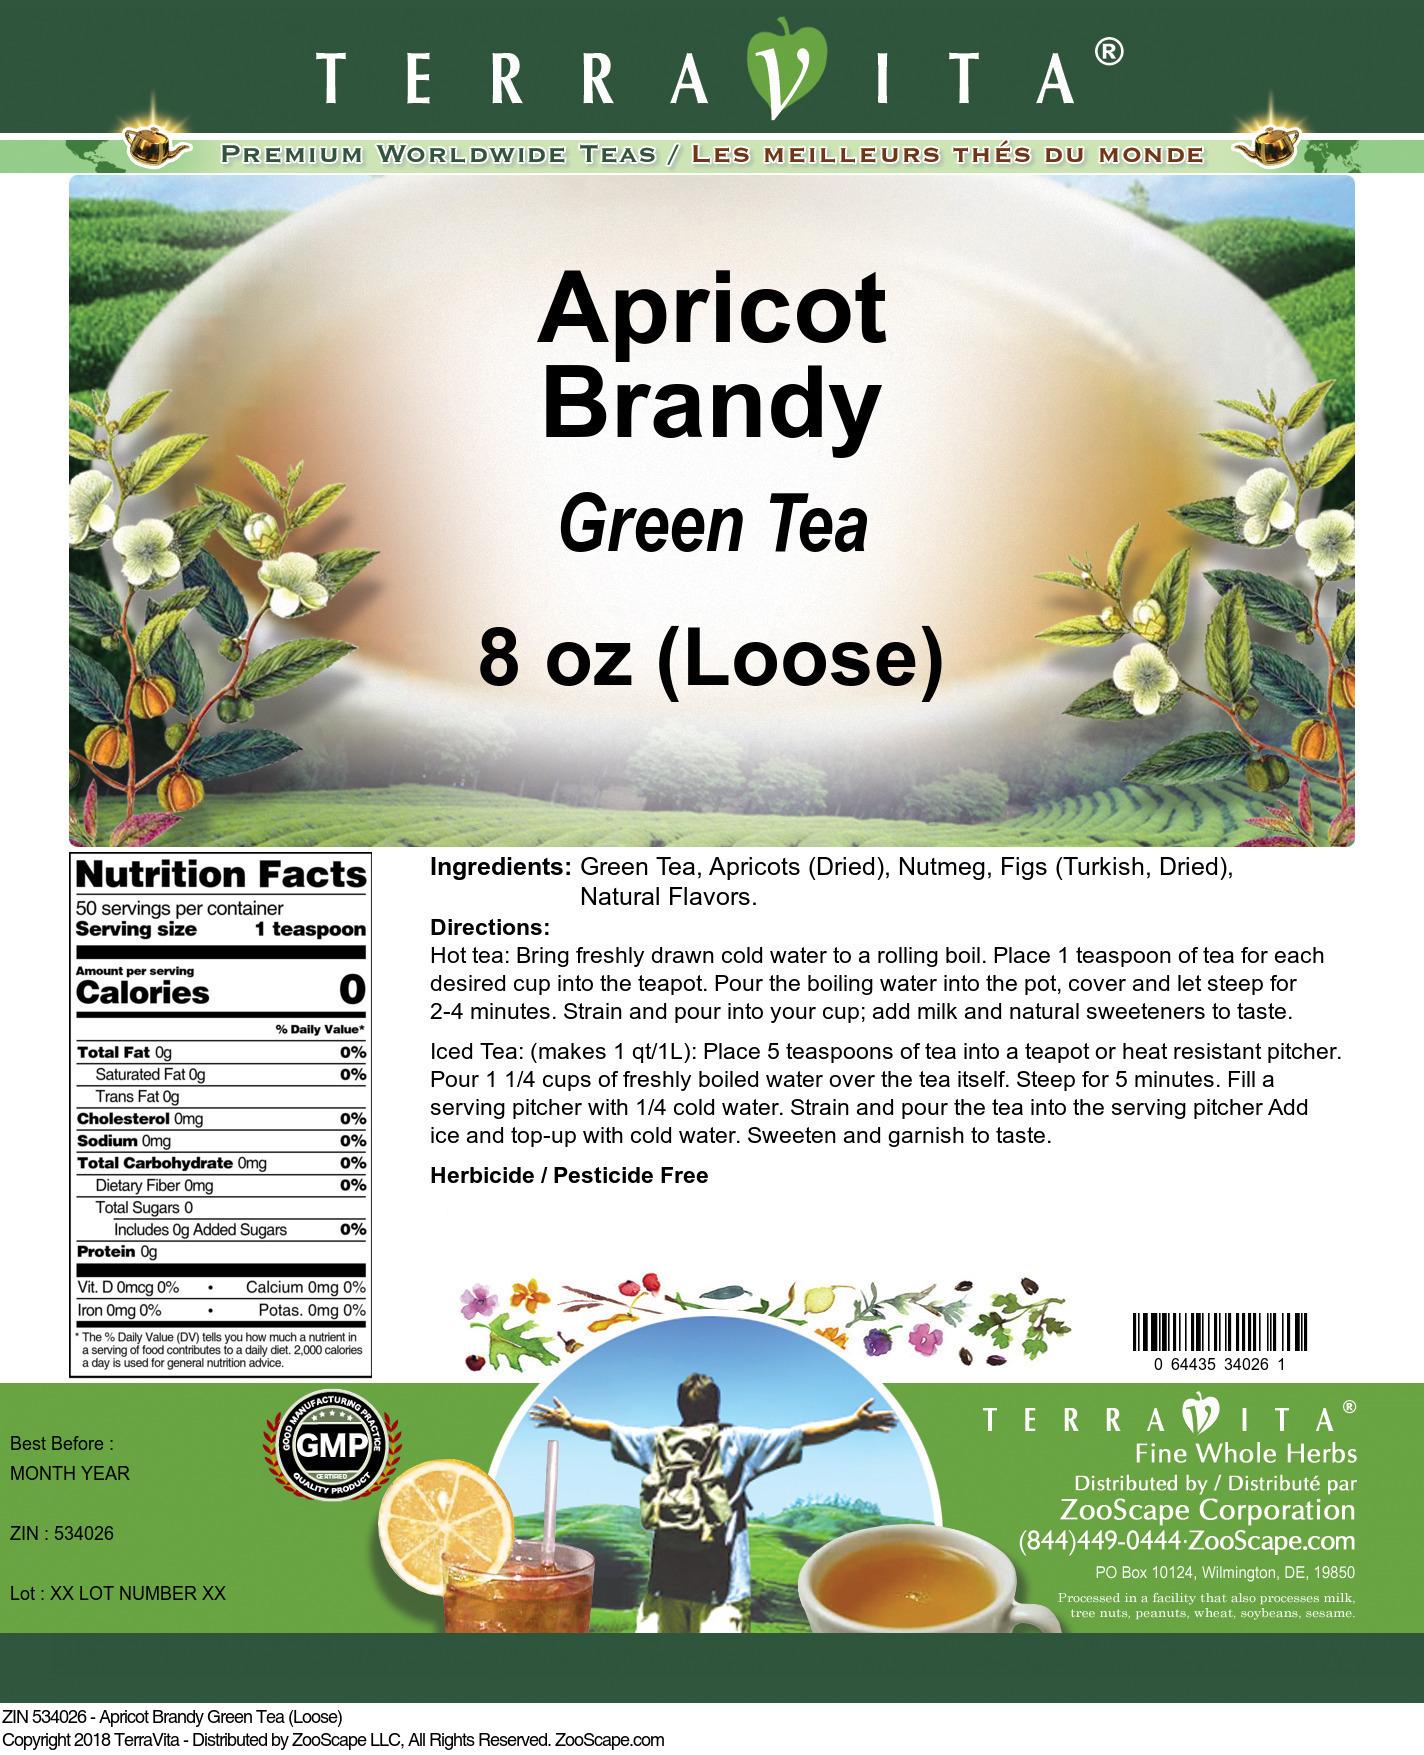 Apricot Brandy Green Tea (Loose)